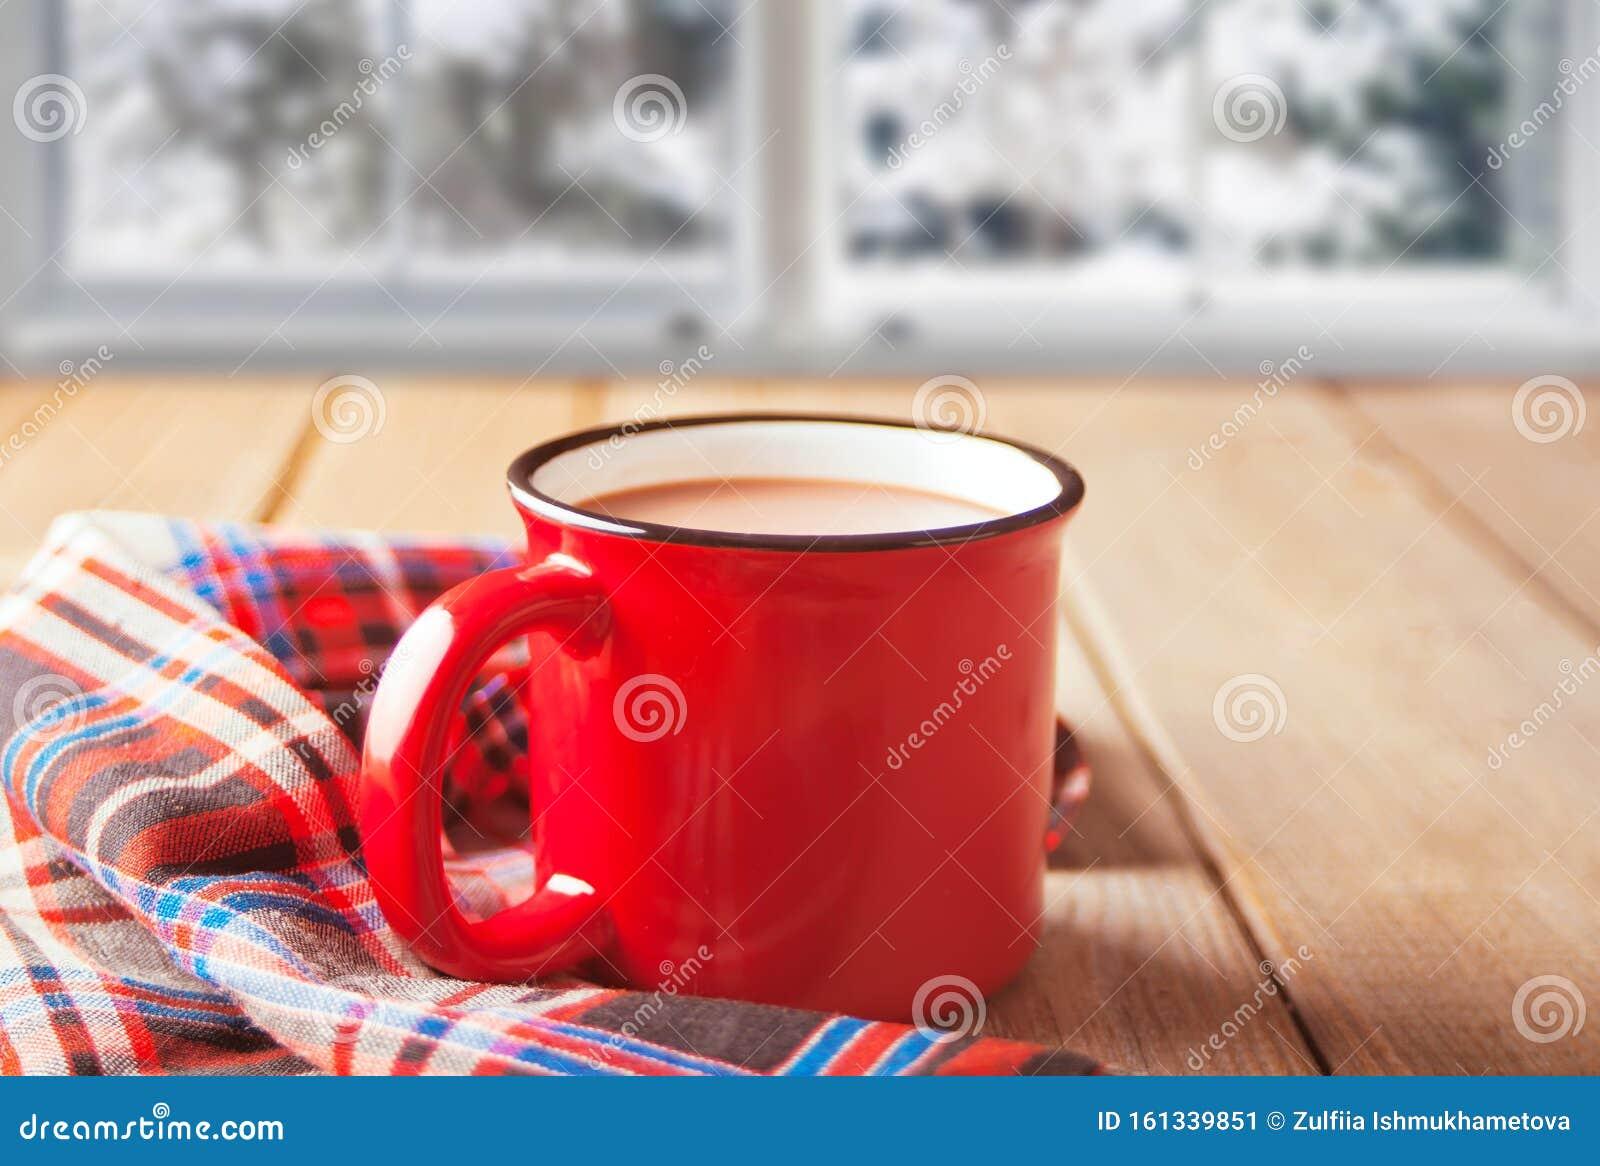 2 650 Red Mug Coffee Window Photos Free Royalty Free Stock Photos From Dreamstime Hd wallpaper red mug garland light